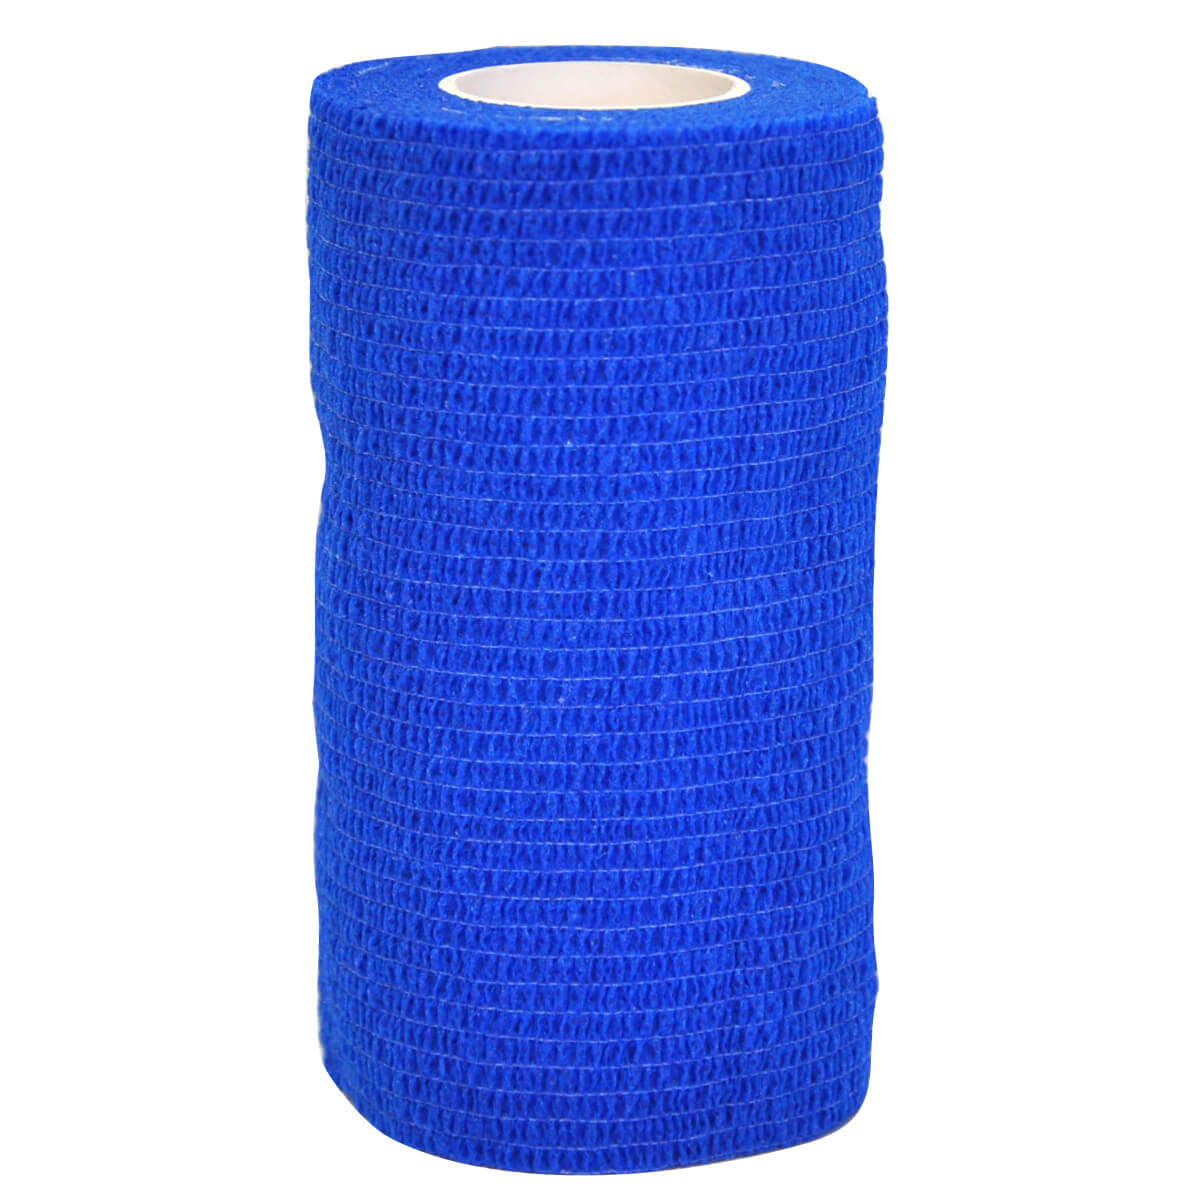 Vet Wrap  - 4-in x 3-ft - Blue